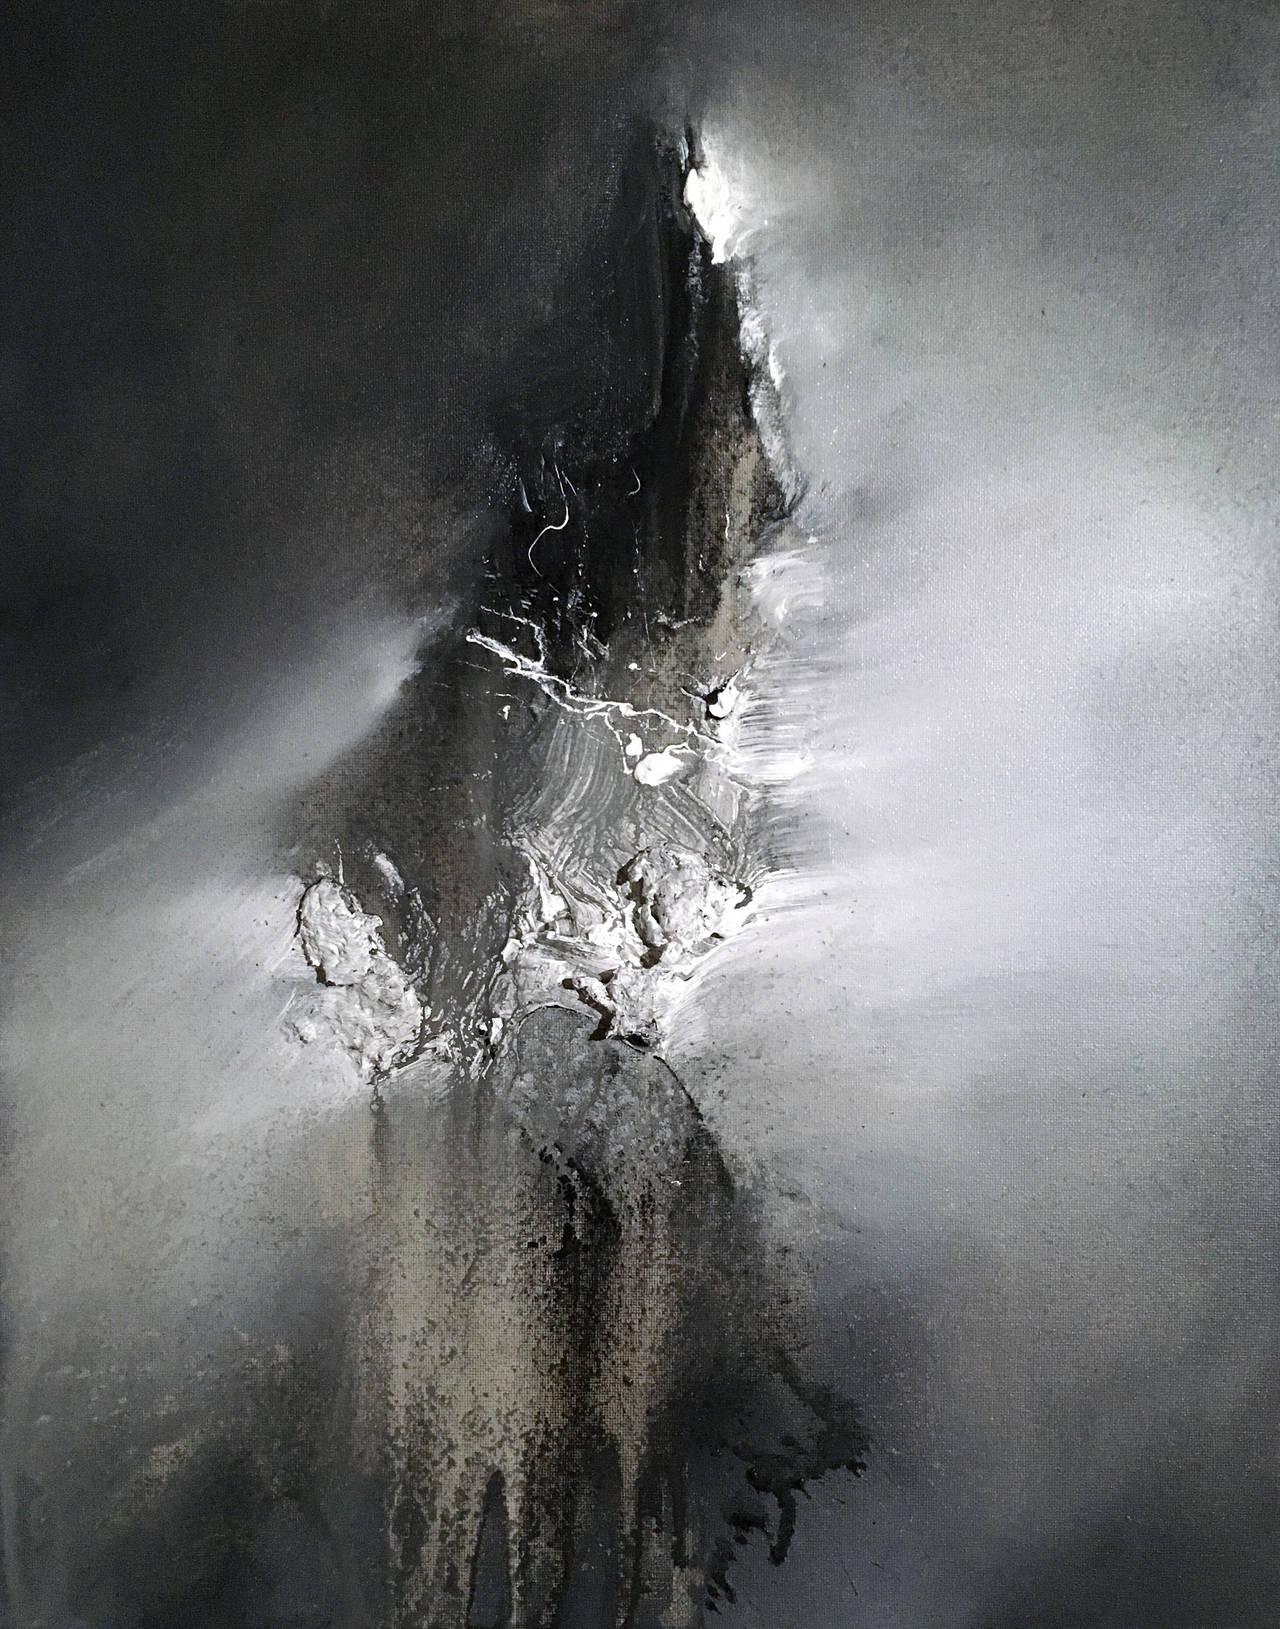 062118 by Senecal